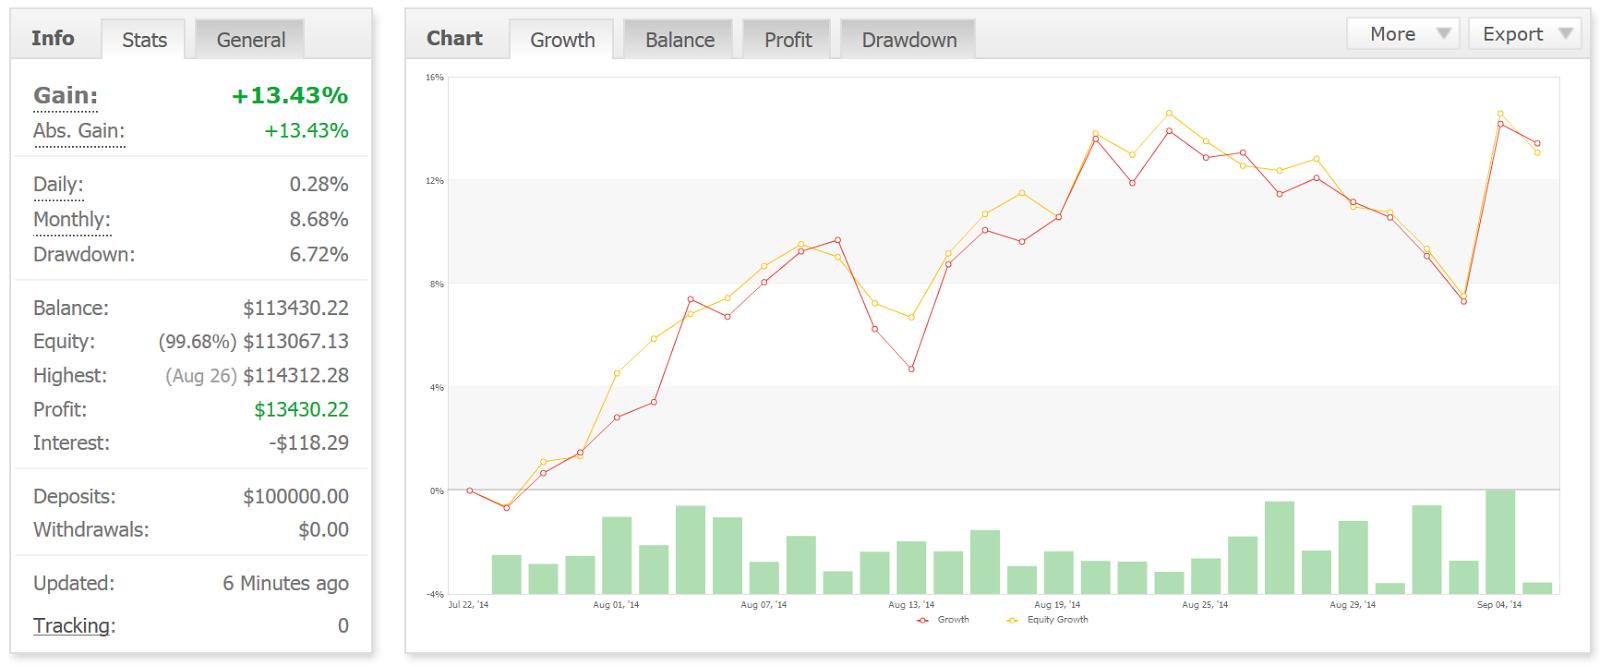 Greattradingsystems.com Chart